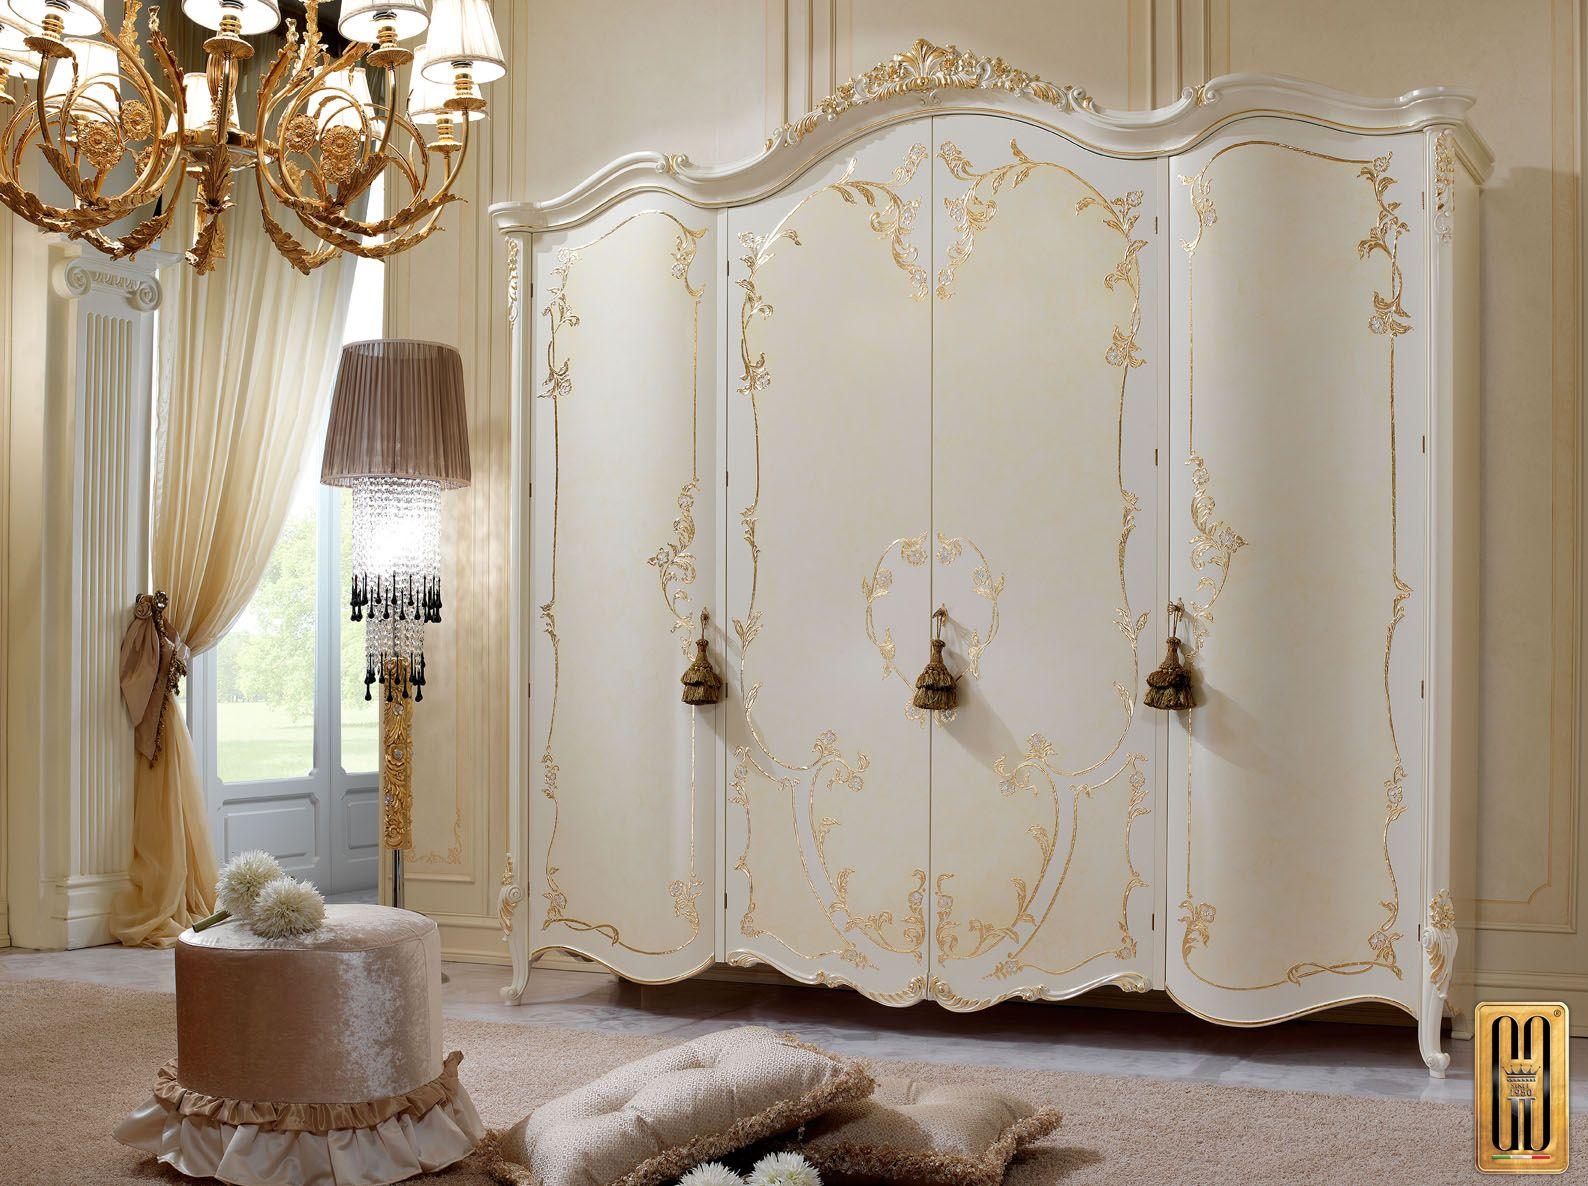 Armadio Collezione Vittoria - Gotha Luxury Bedroom Forniture ...